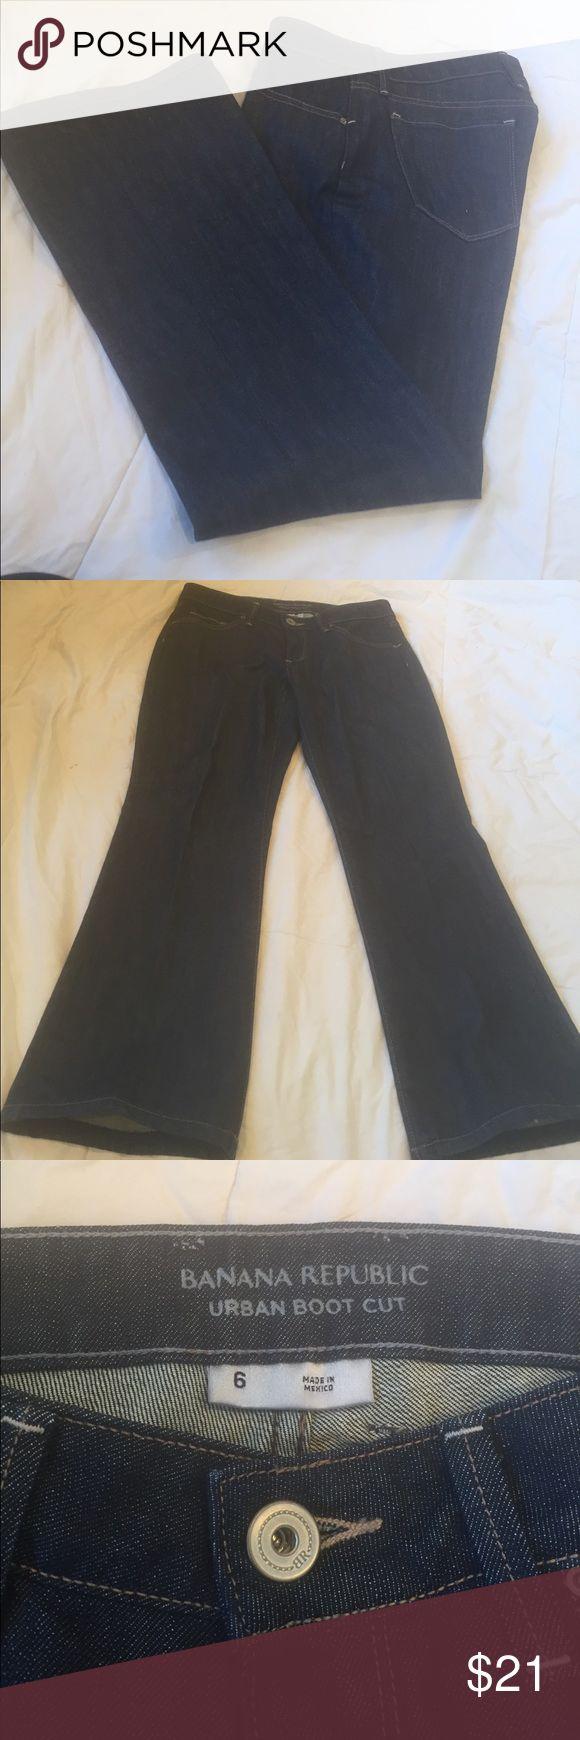 BANANA REPUBLIC URBAN BOOT CUT JEAN BANANA REPUBLIC URBAN BOOT CUT JEAN, dark blue jean. Wear one time. Good for weekend or Friday work casual Banana Republic Jeans Boot Cut